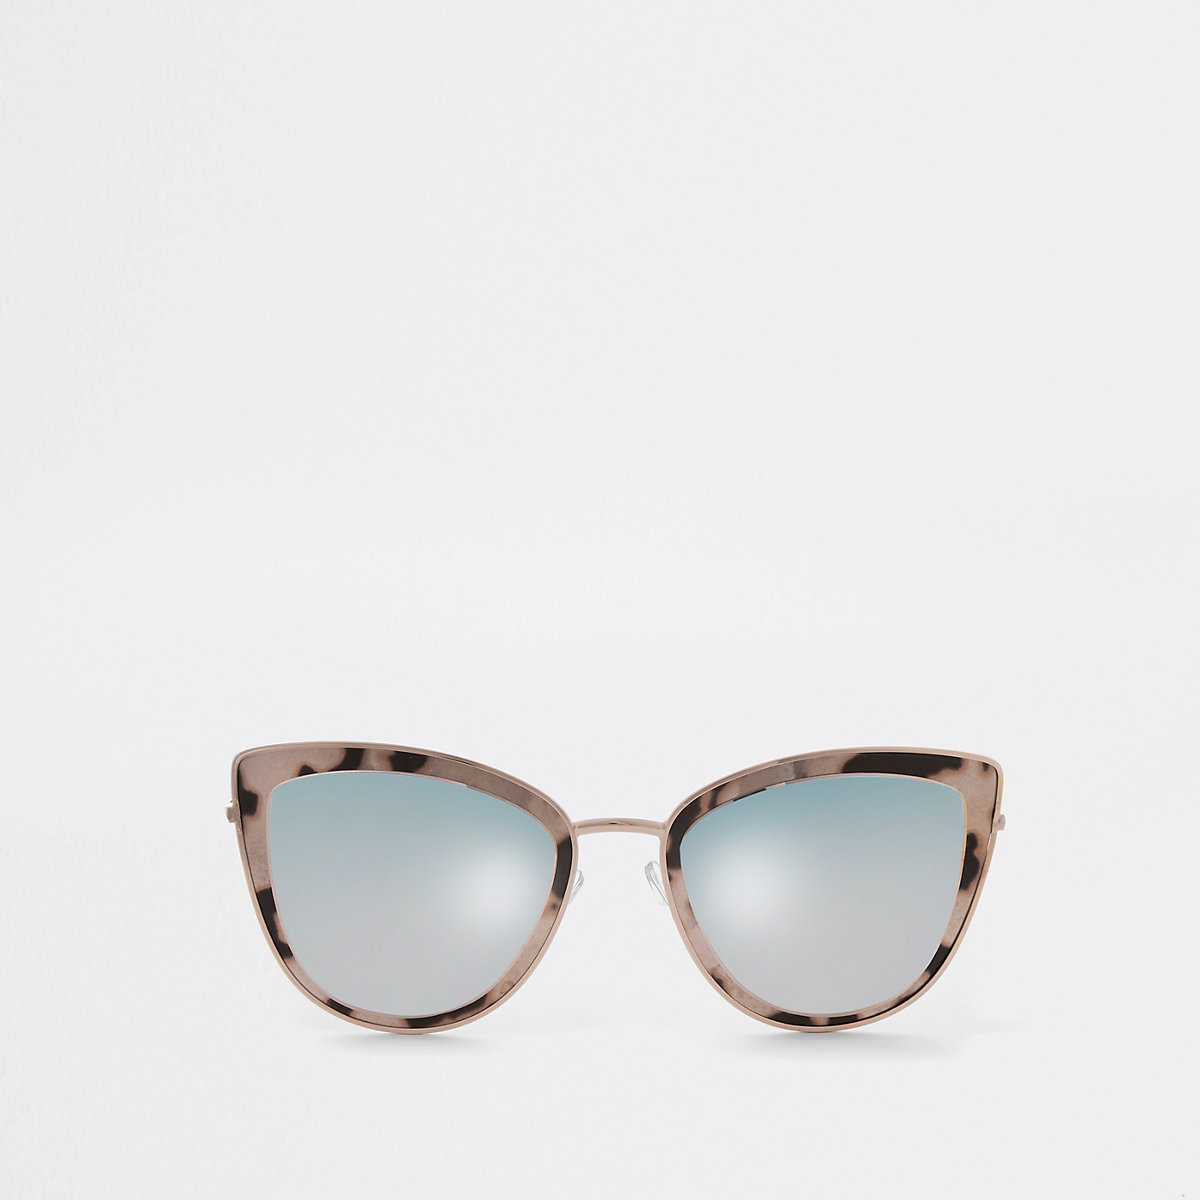 Rose gold tone cat eye smoke lens sunglasses